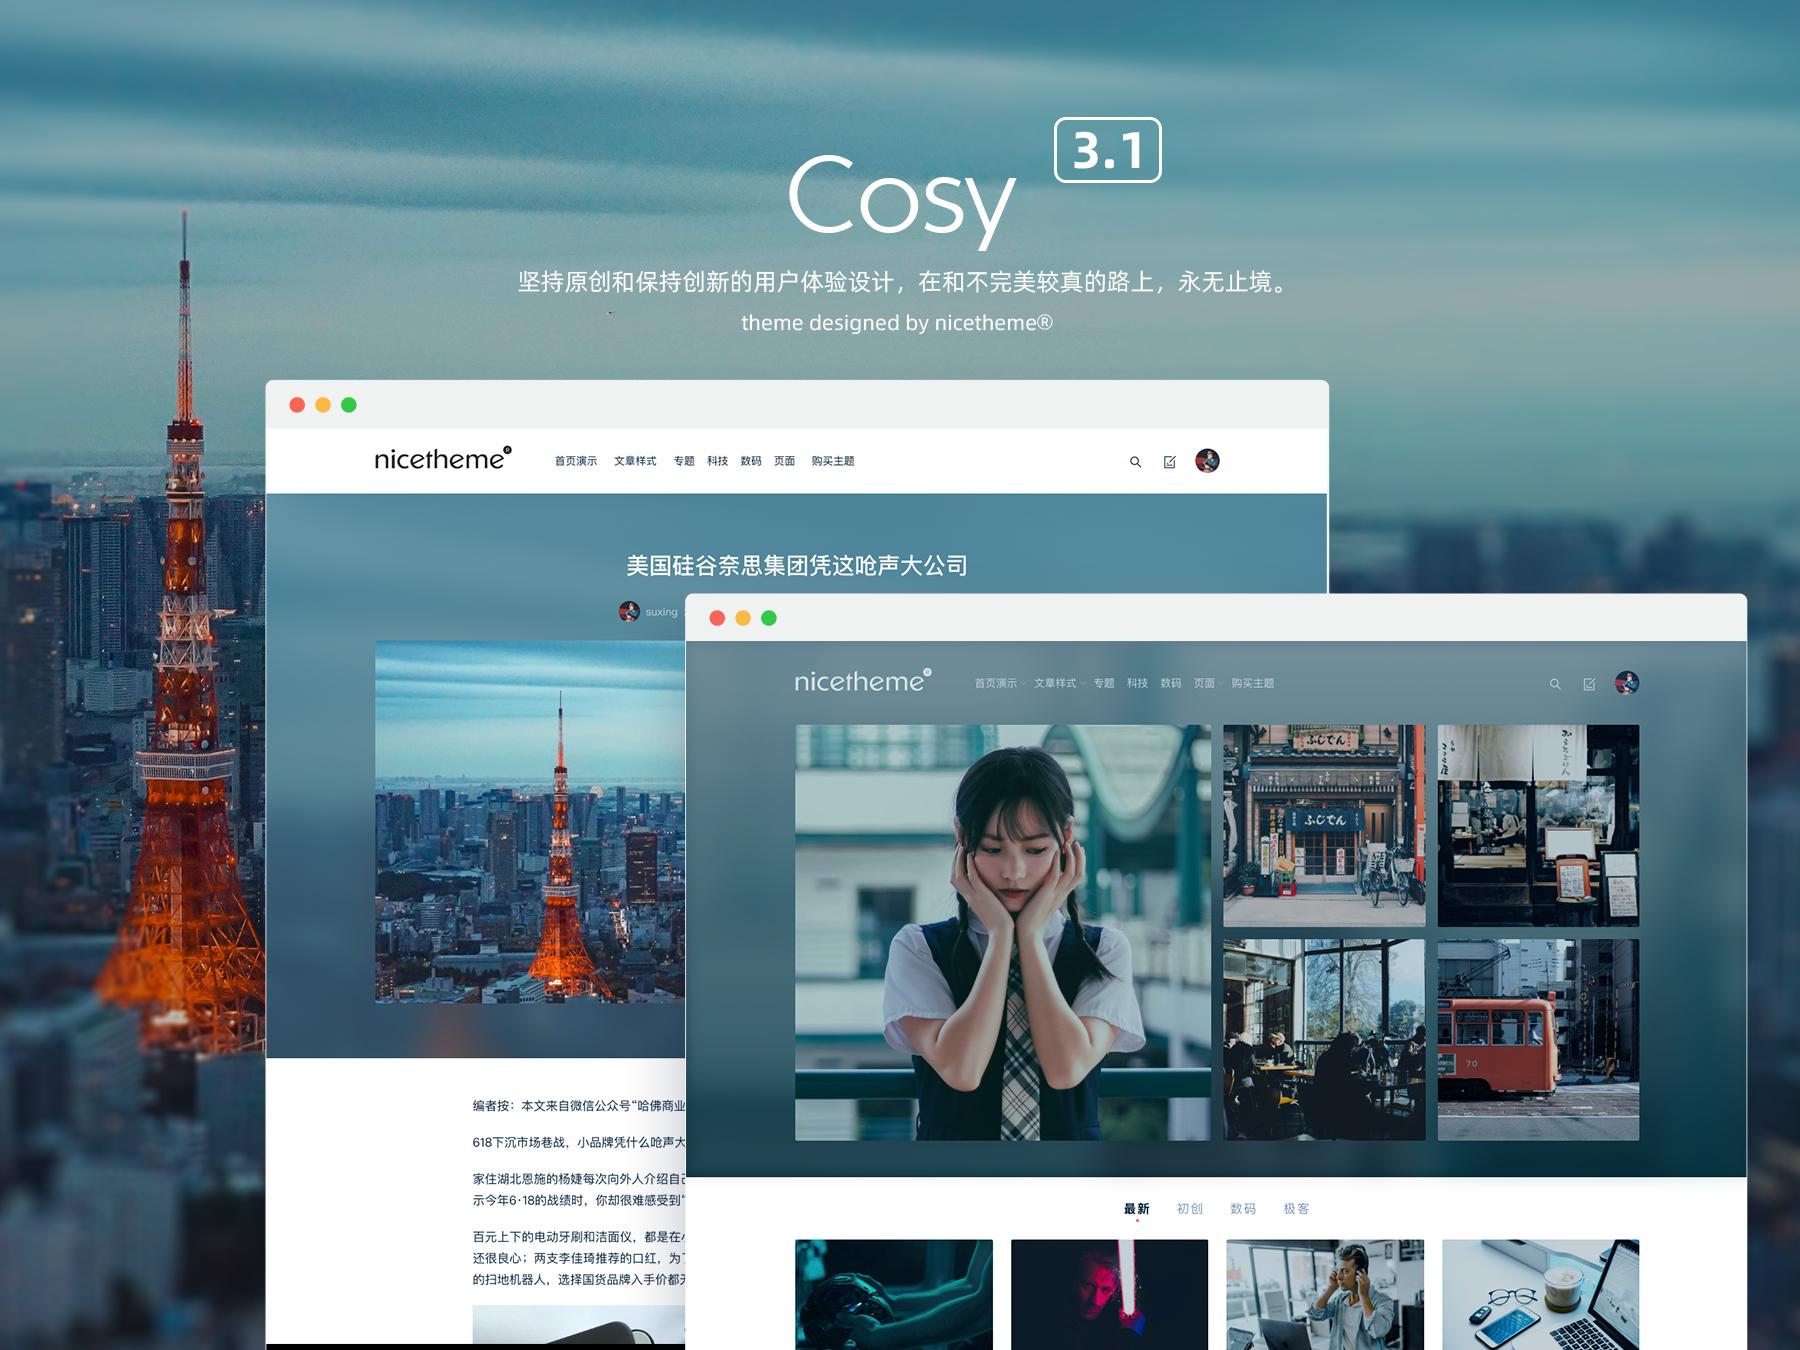 WordPress杂志主题:Cosy 主题更新至v3.1,优雅和好用并存-苏醒